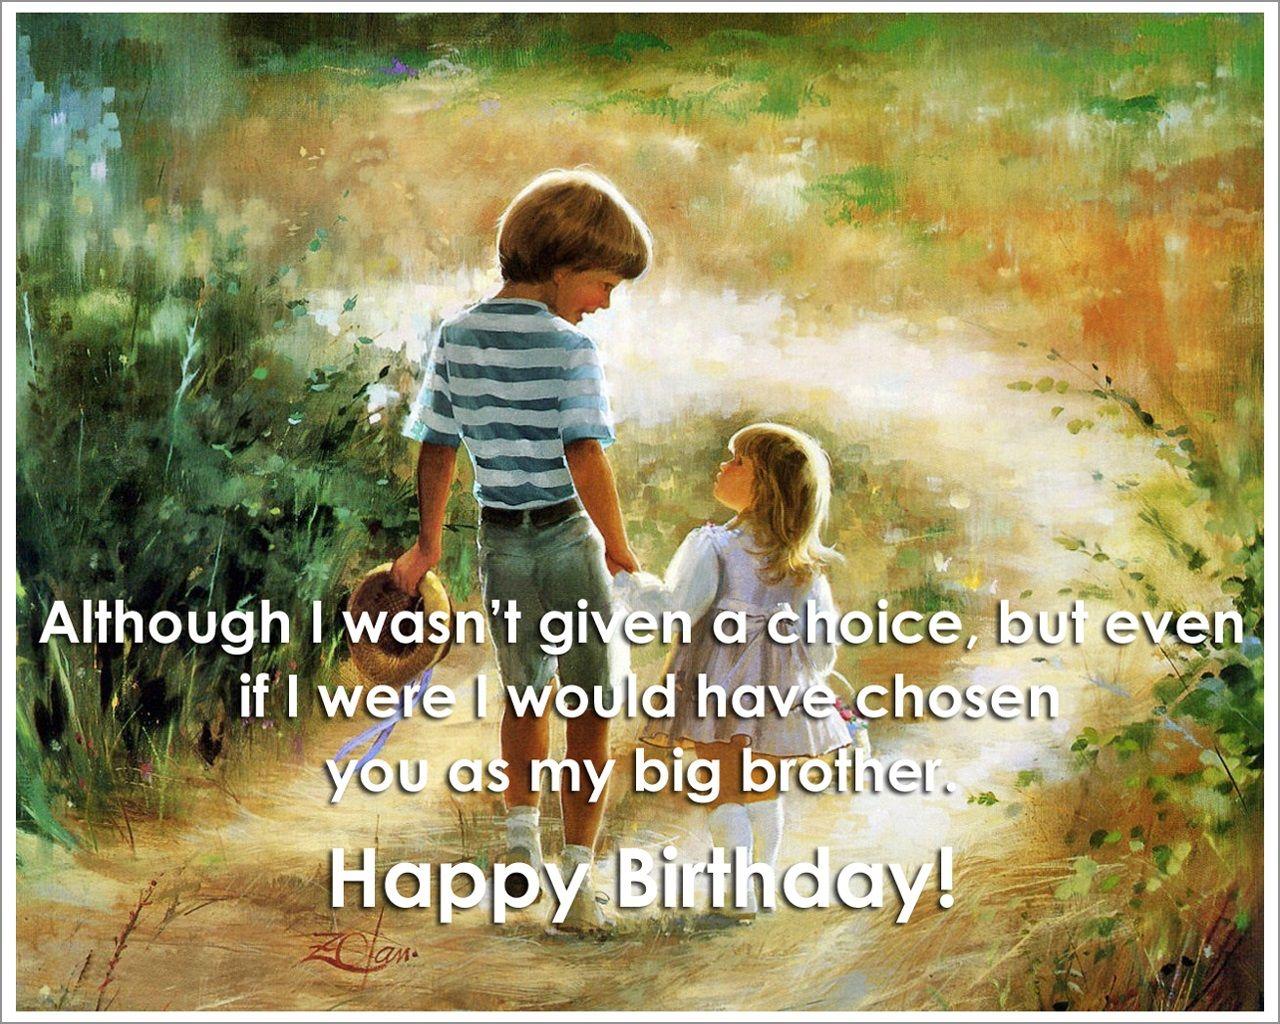 Happy Birthday Quotes For Brother Happy Birthday Celebrations Birthday Wishes For Brother Birthday Quotes Funny Happy Birthday Brother